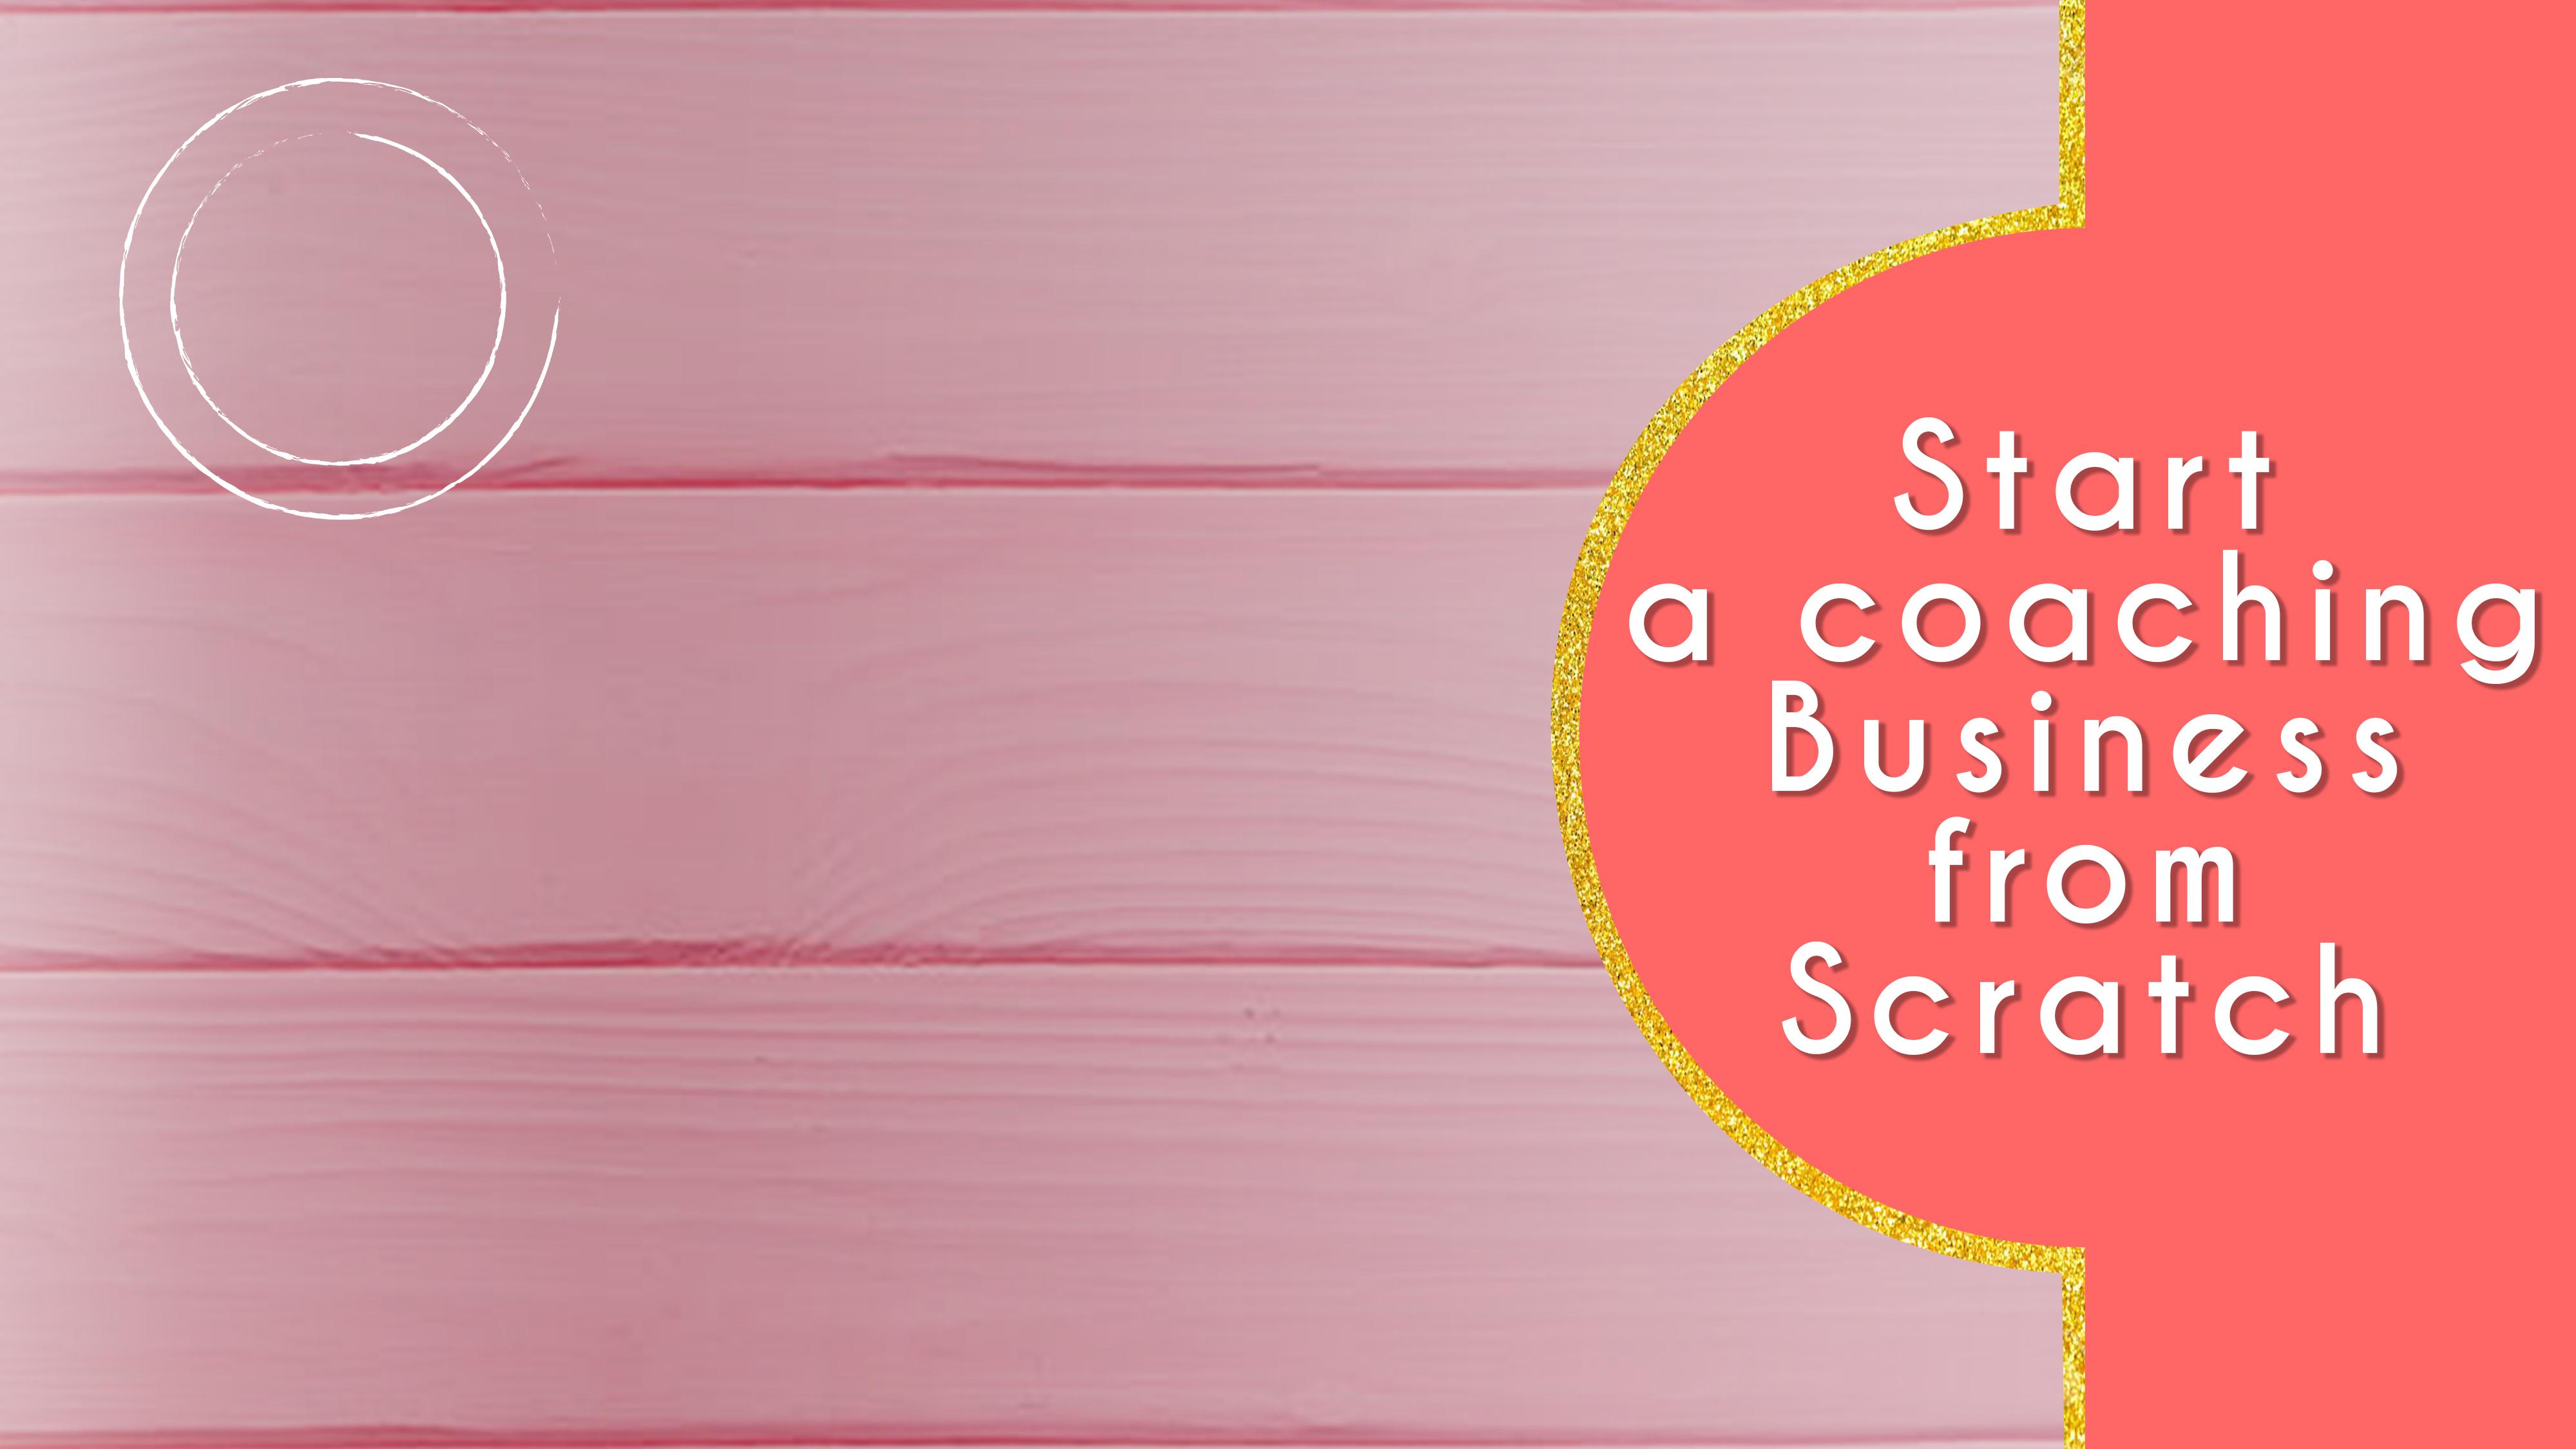 Start a Coaching Business from Scratch